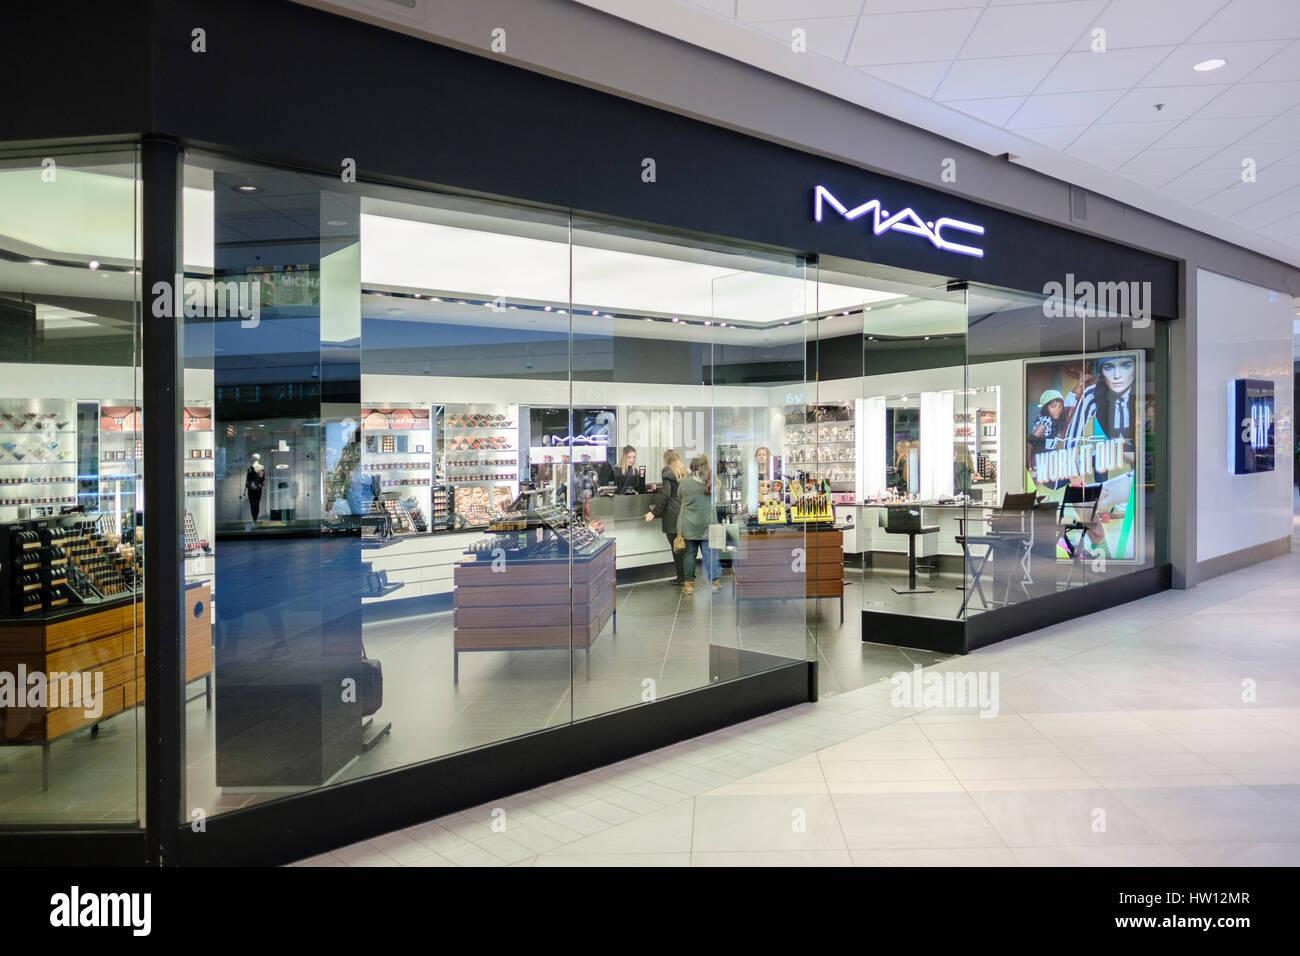 3d9eed81e0a27 Mac Cosmetics Store Stock Photos   Mac Cosmetics Store Stock Images ...